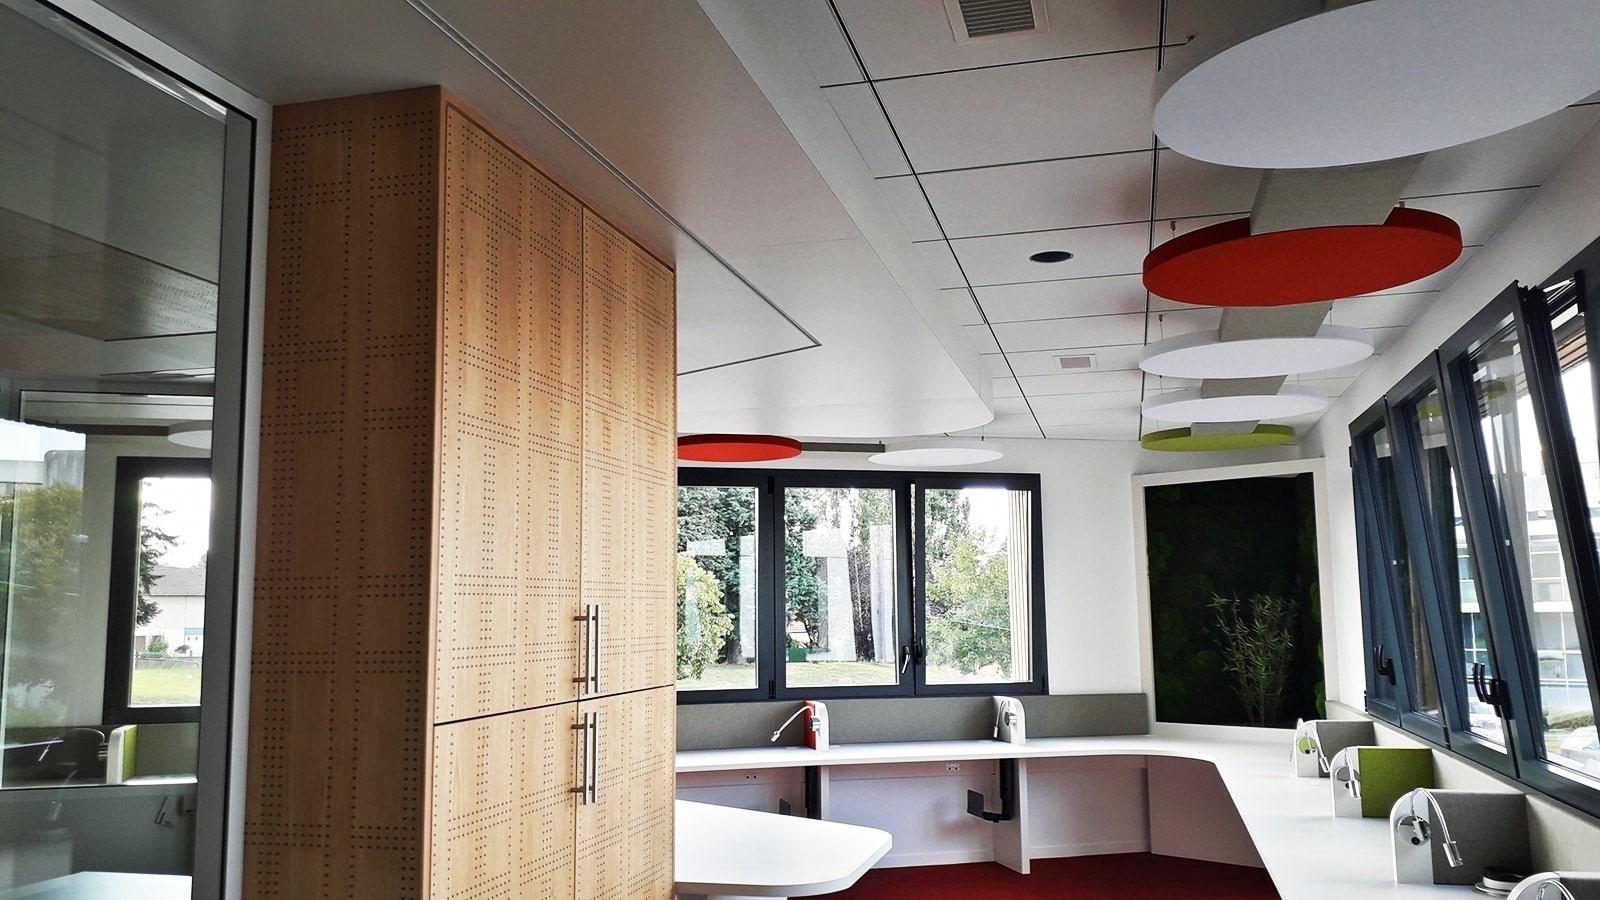 Bureaux Had Cholet Efi Design (1)